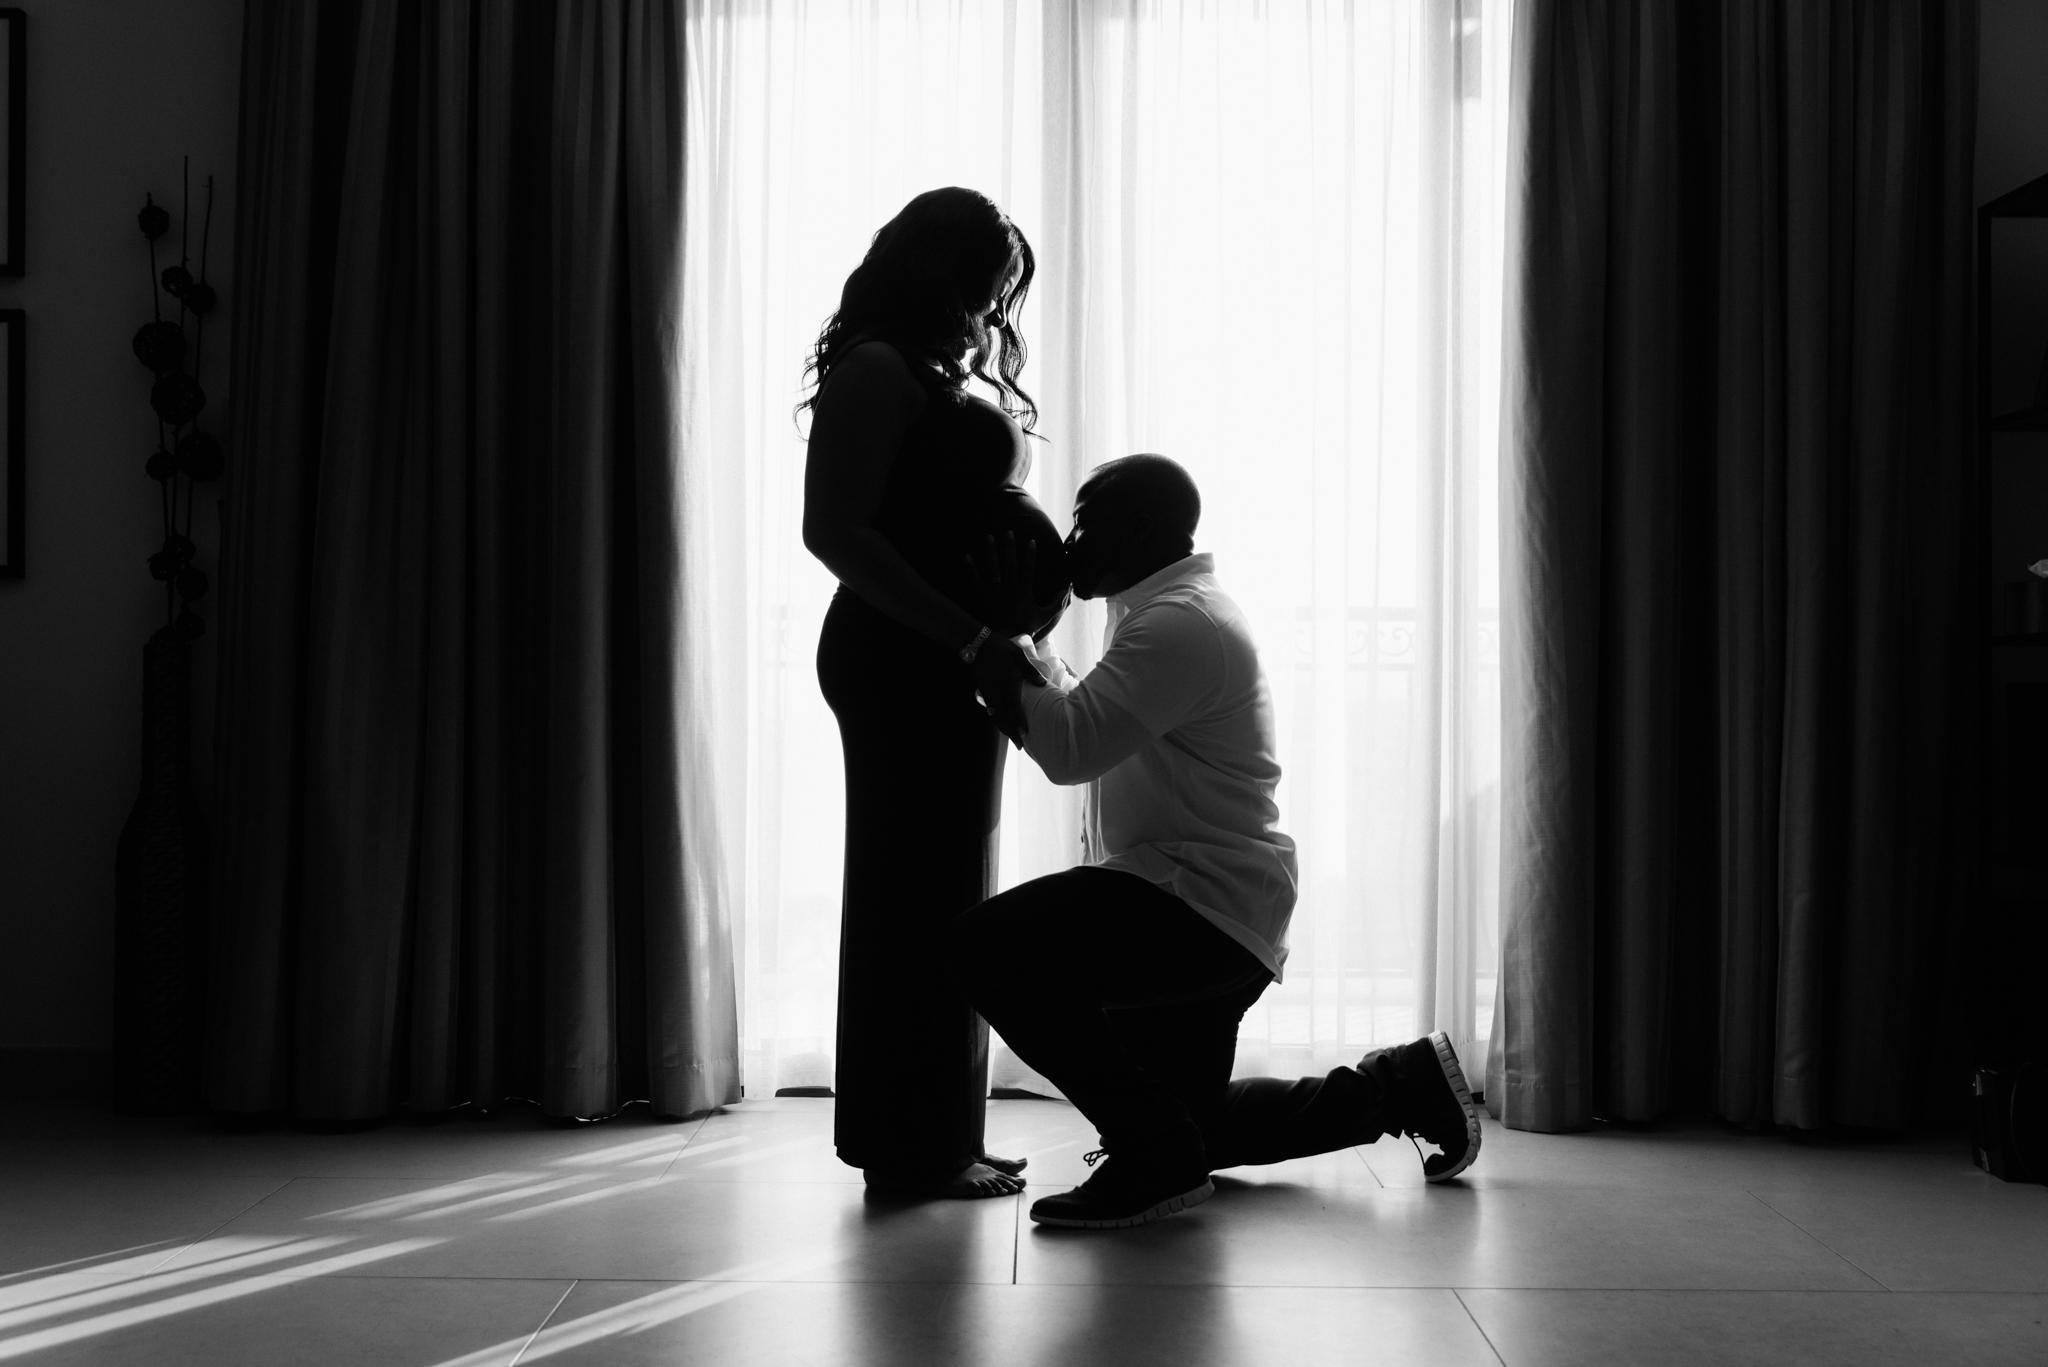 Lana-Photographs-Dubai-Maternity-Photographer-Kristina-PSLR-11.jpg